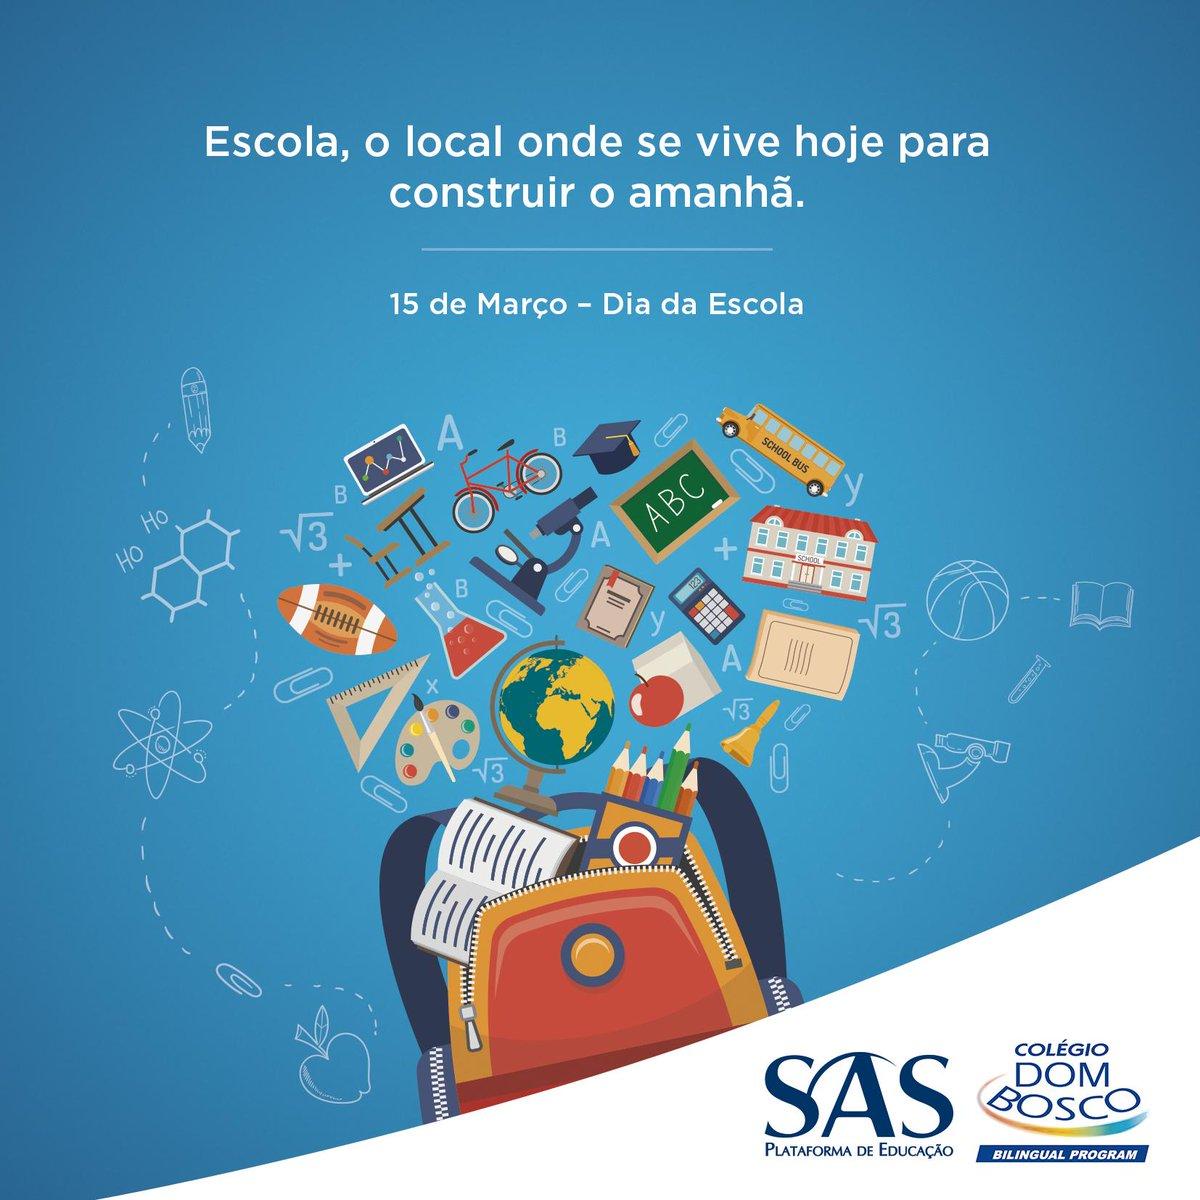 Colégio Dom Bosco SP's photo on #DiaDaEscola